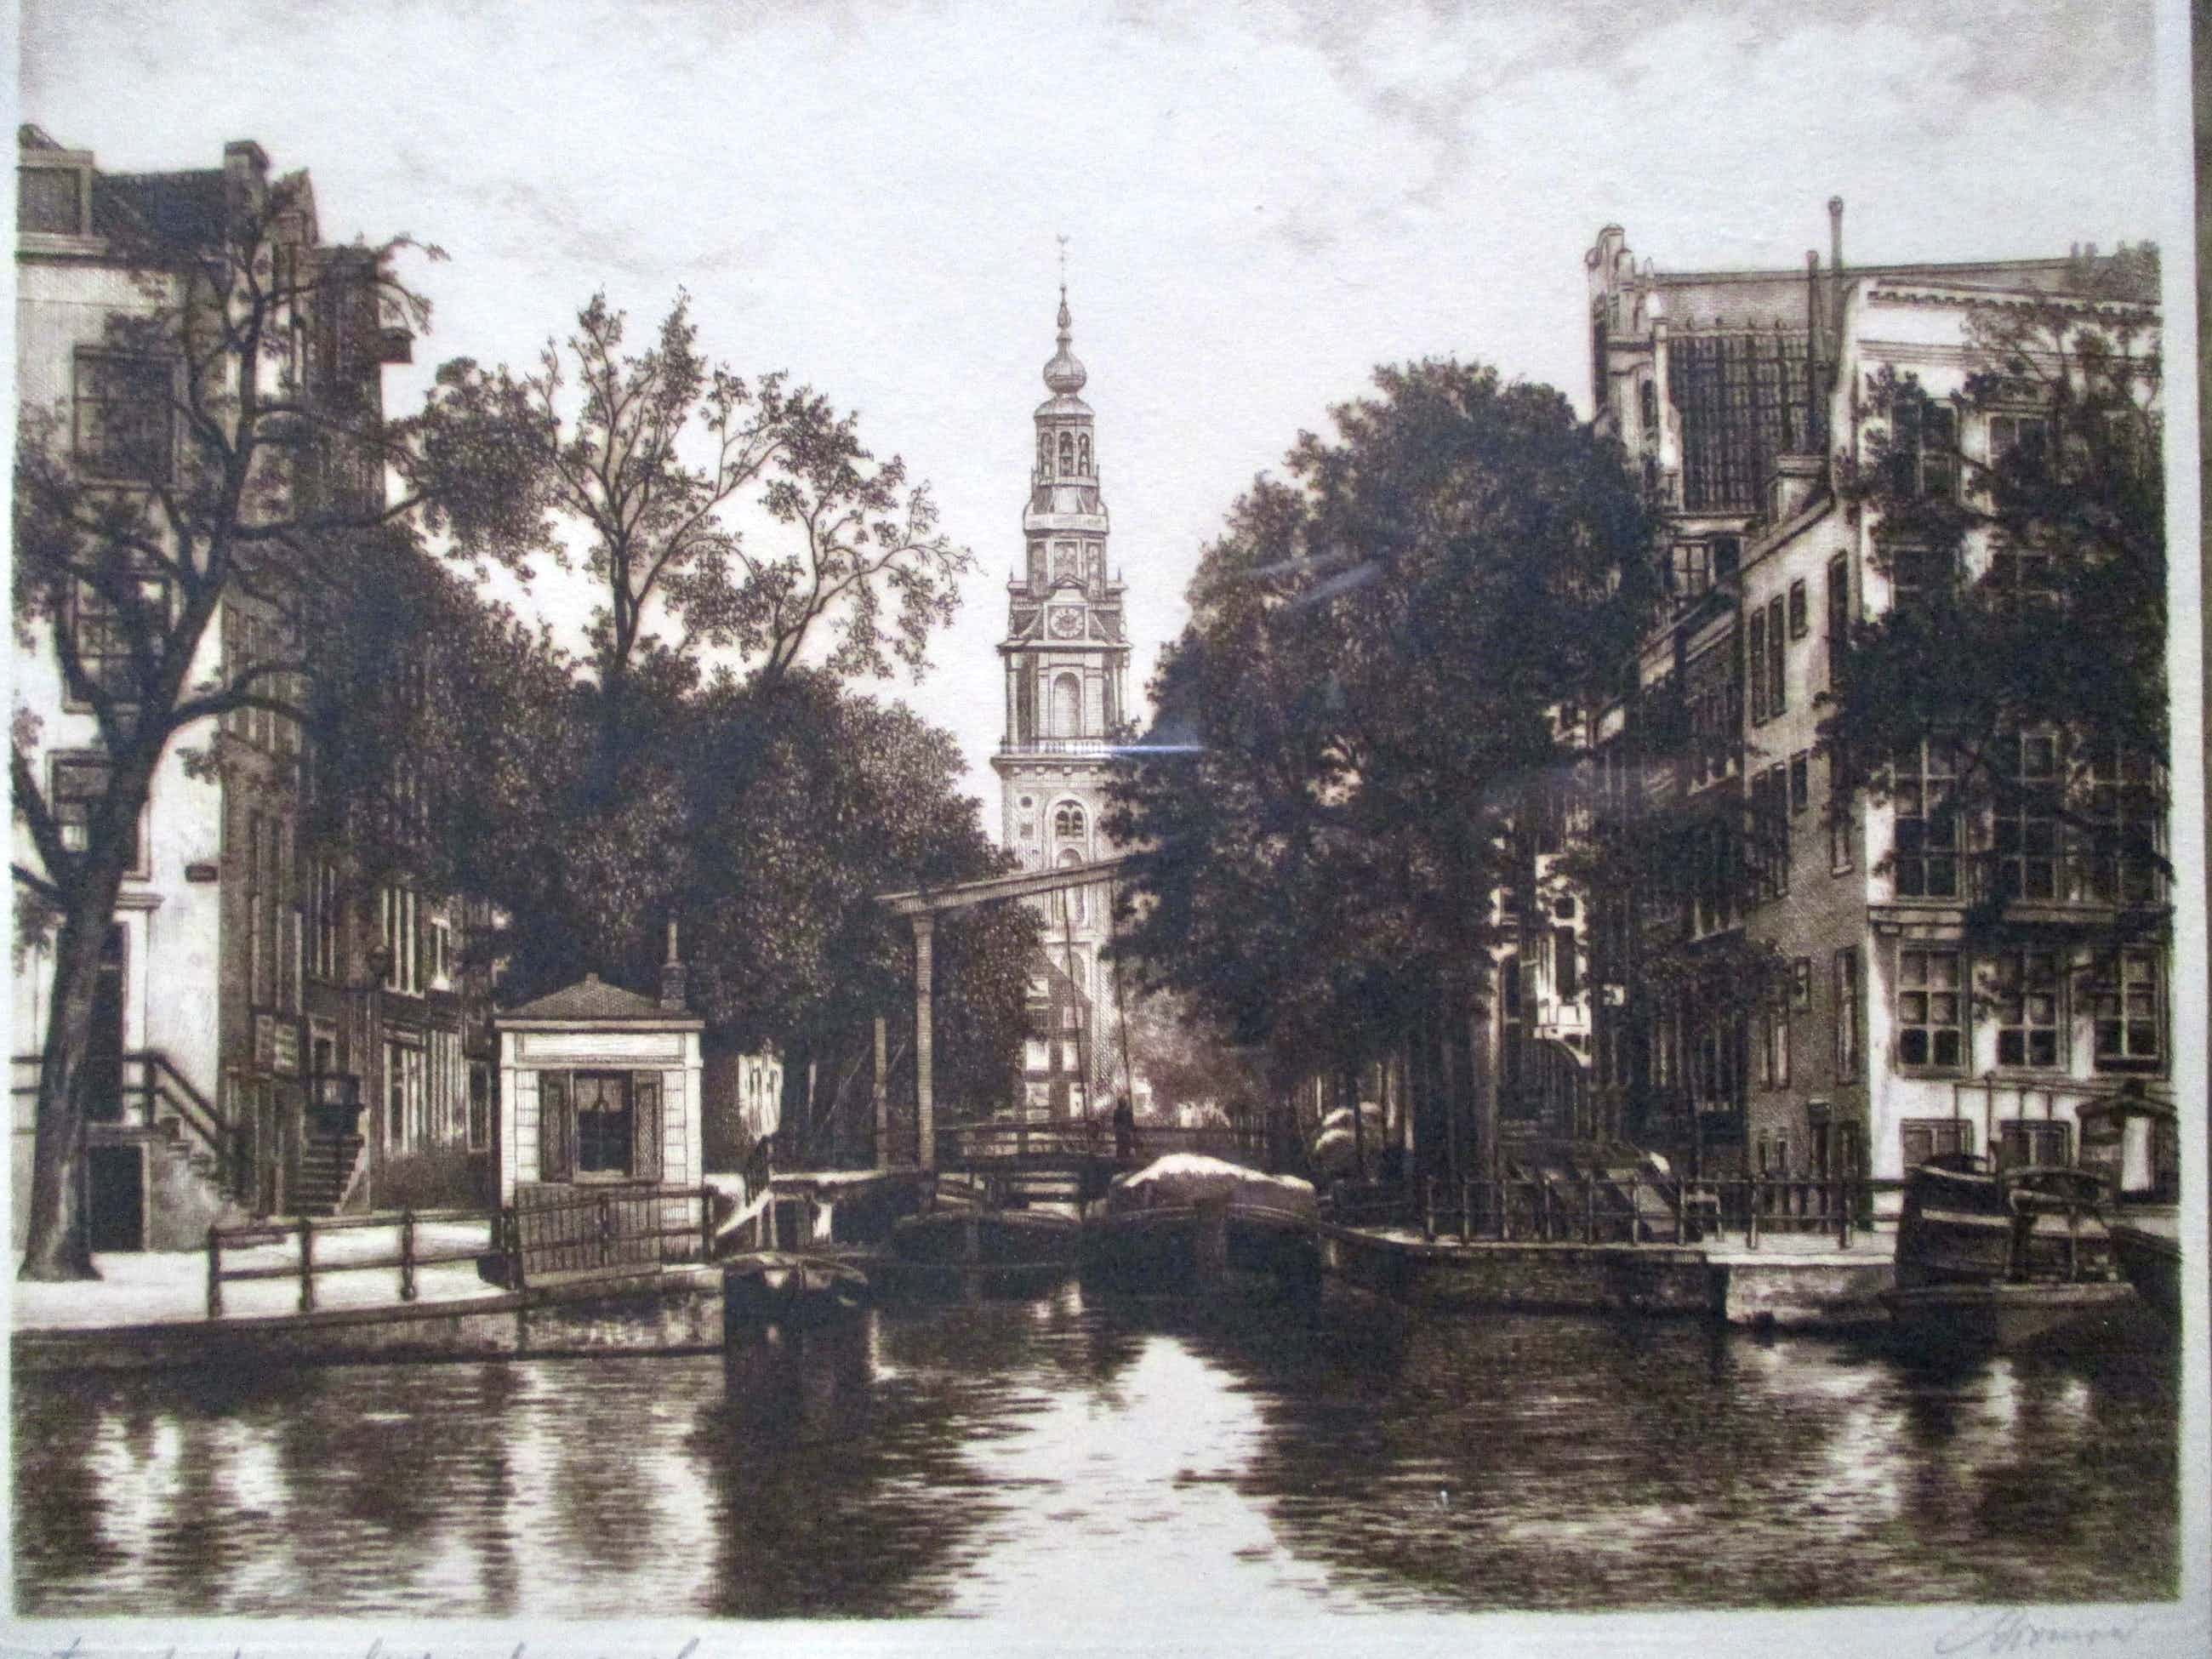 Niet of onleesbaar gesigneerd - Ingelijste ets Groenburgwal Amsterdam, gesigneerd kopen? Bied vanaf 5!